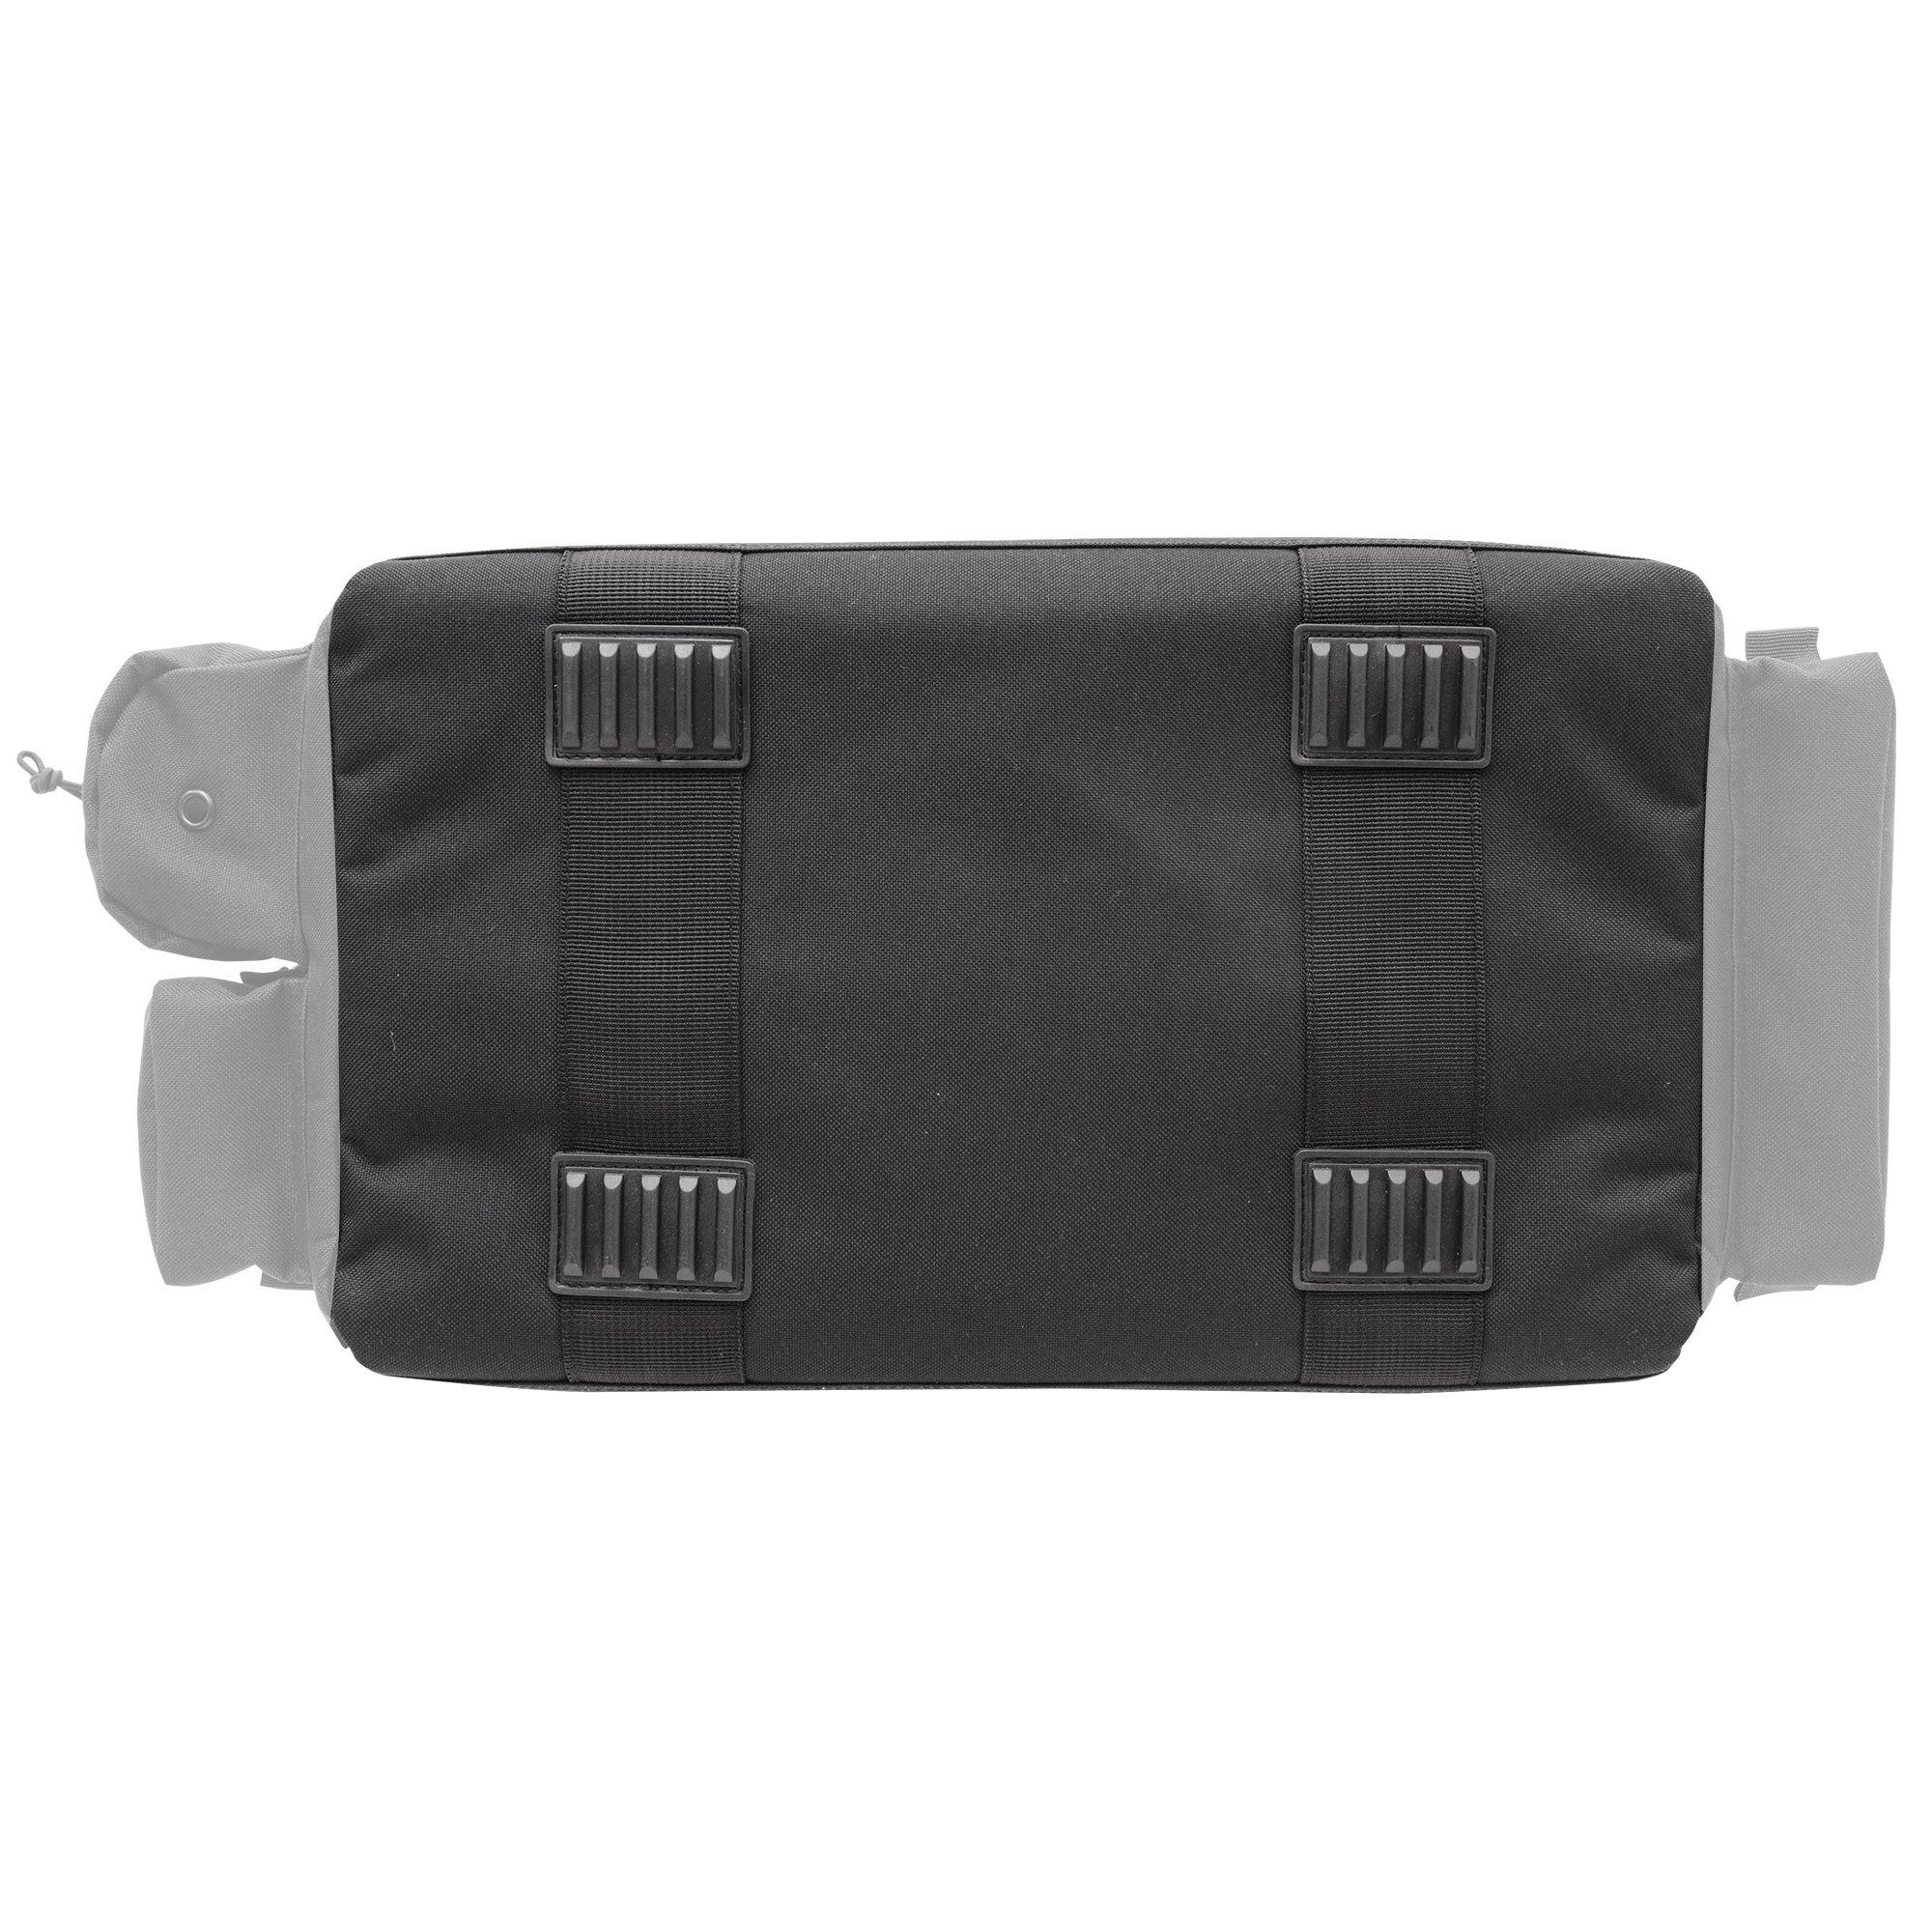 UTG All in One Range/Utility Go Bag, Black, 21'' x 10'' x 9'' by UTG (Image #13)